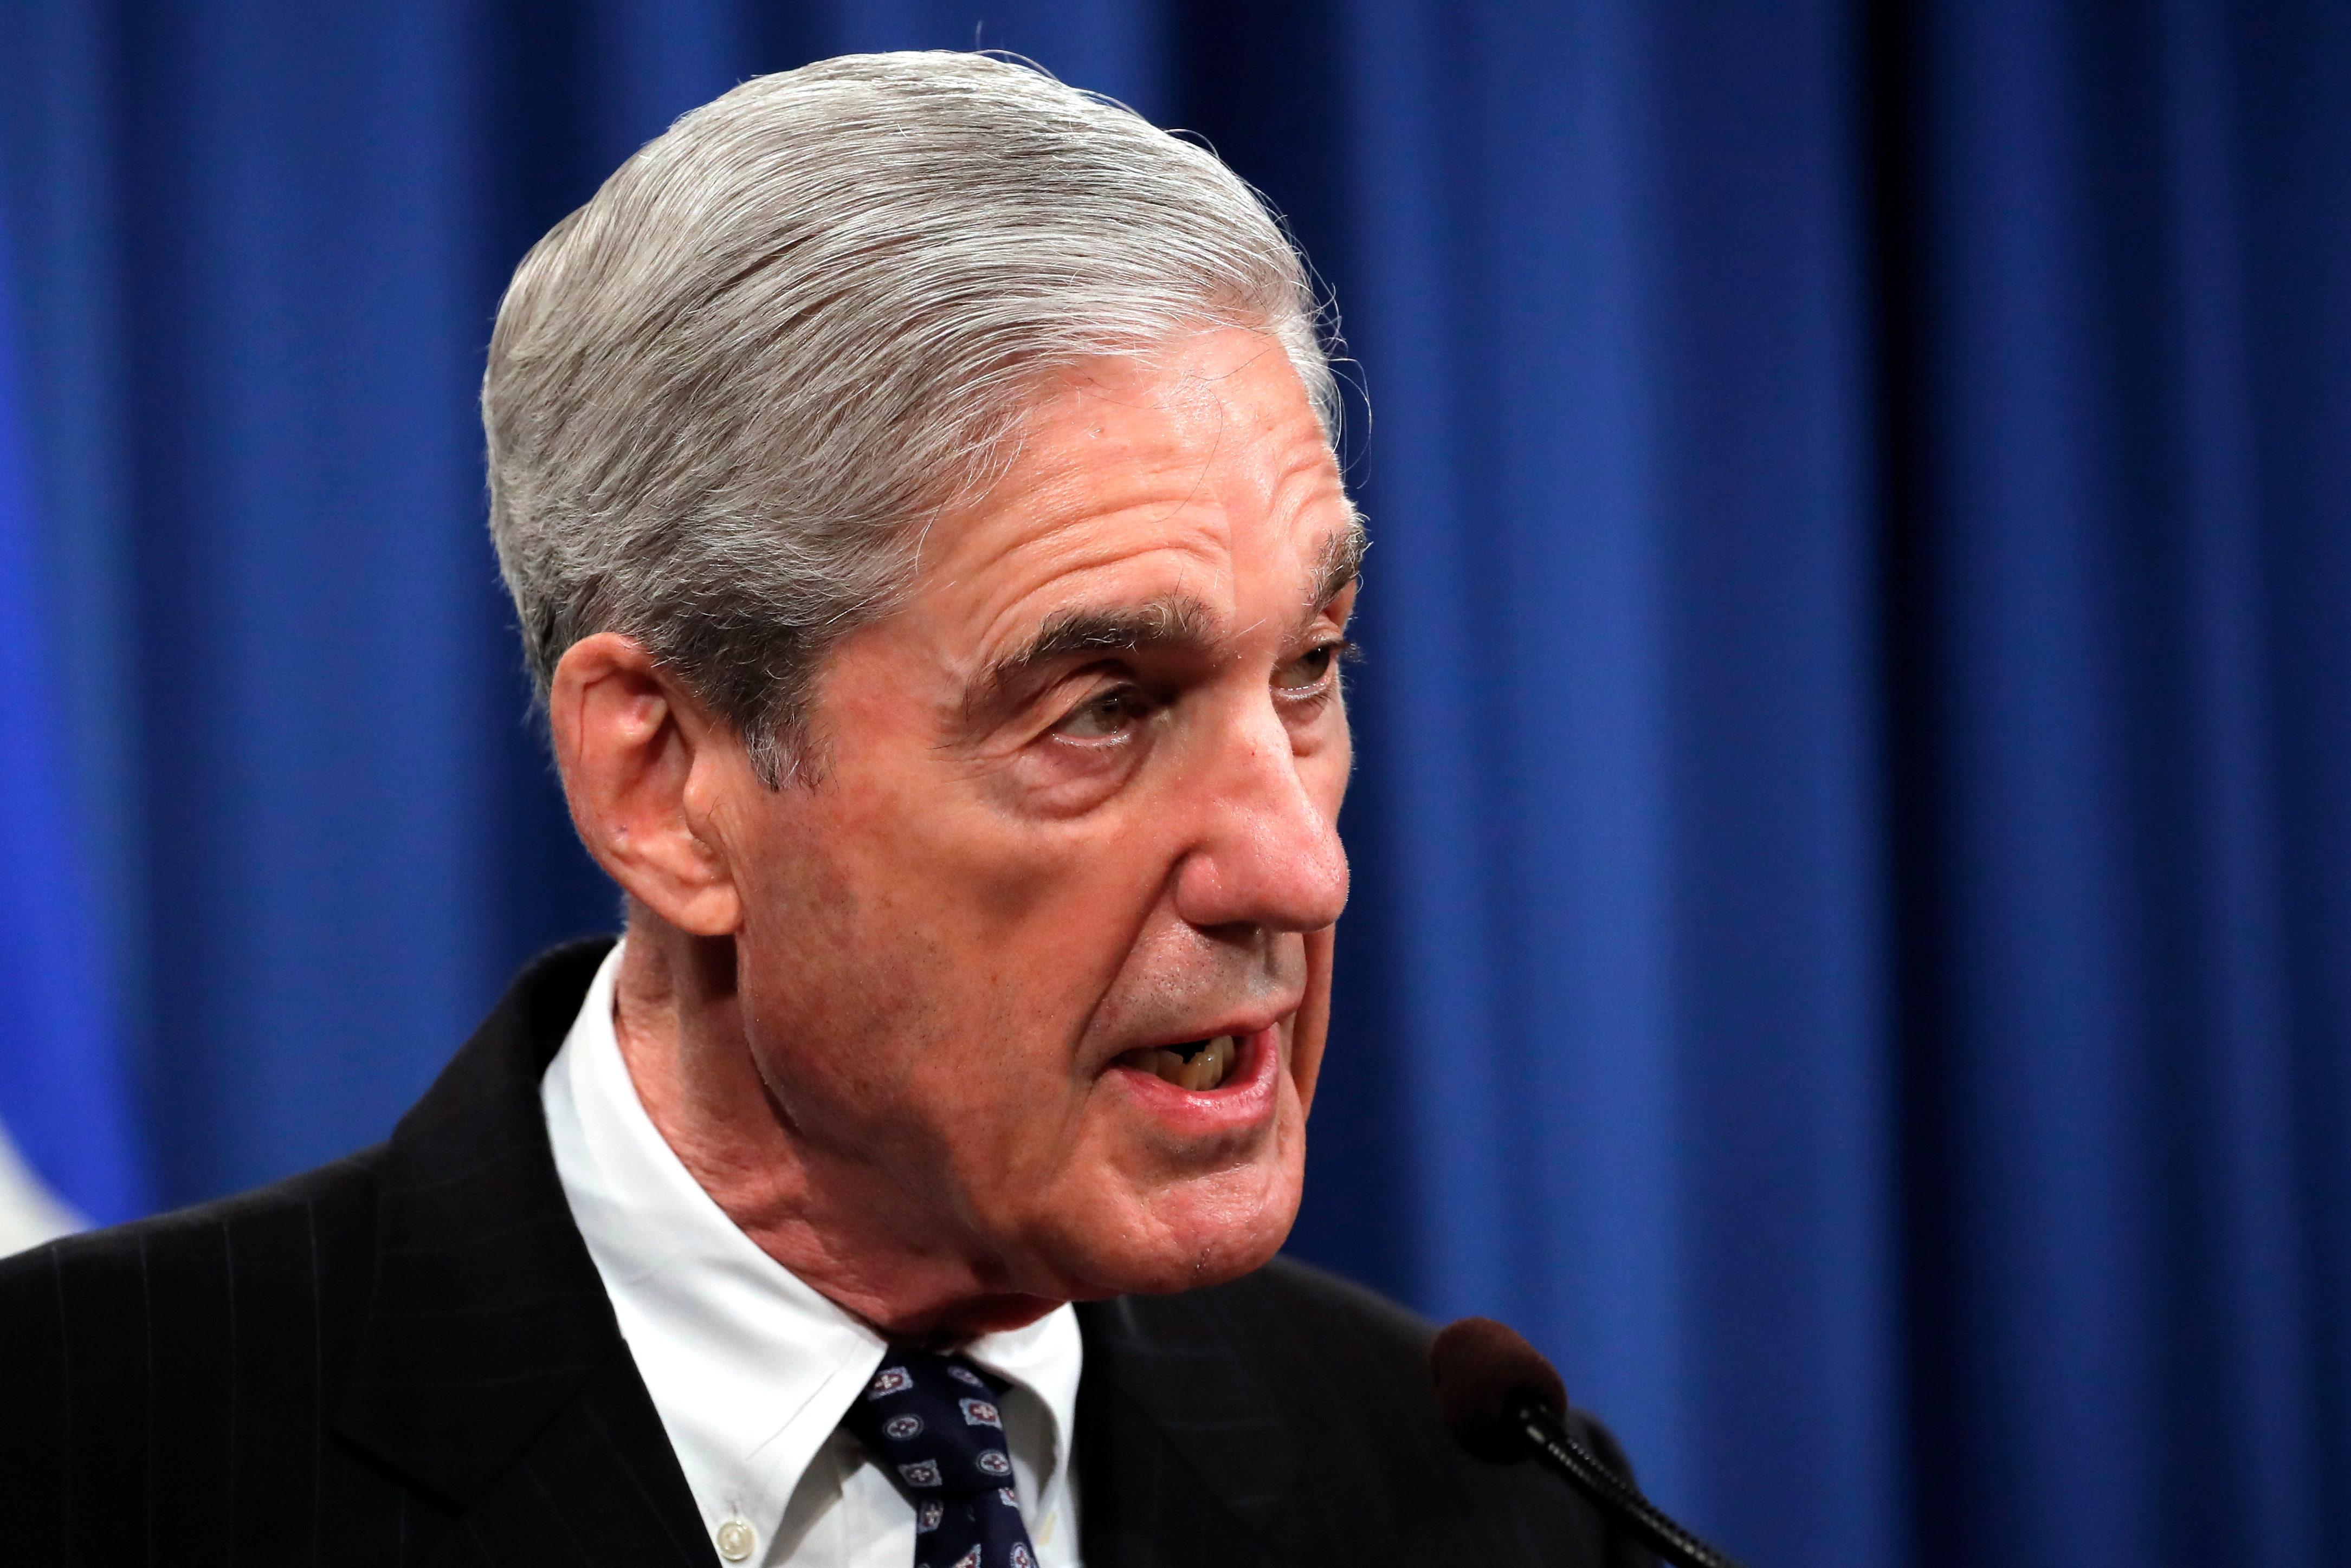 Westlake Legal Group Mueller053119_C_AP DOJ reveals no Mueller grand jury material shared with any foreign government Melissa Leon fox-news/politics/justice-department fox-news/person/robert-mueller fox-news/news-events/russia-investigation fox news fnc/politics fnc article 6f5d4078-8af6-51a1-b0fa-9edd4d31a653